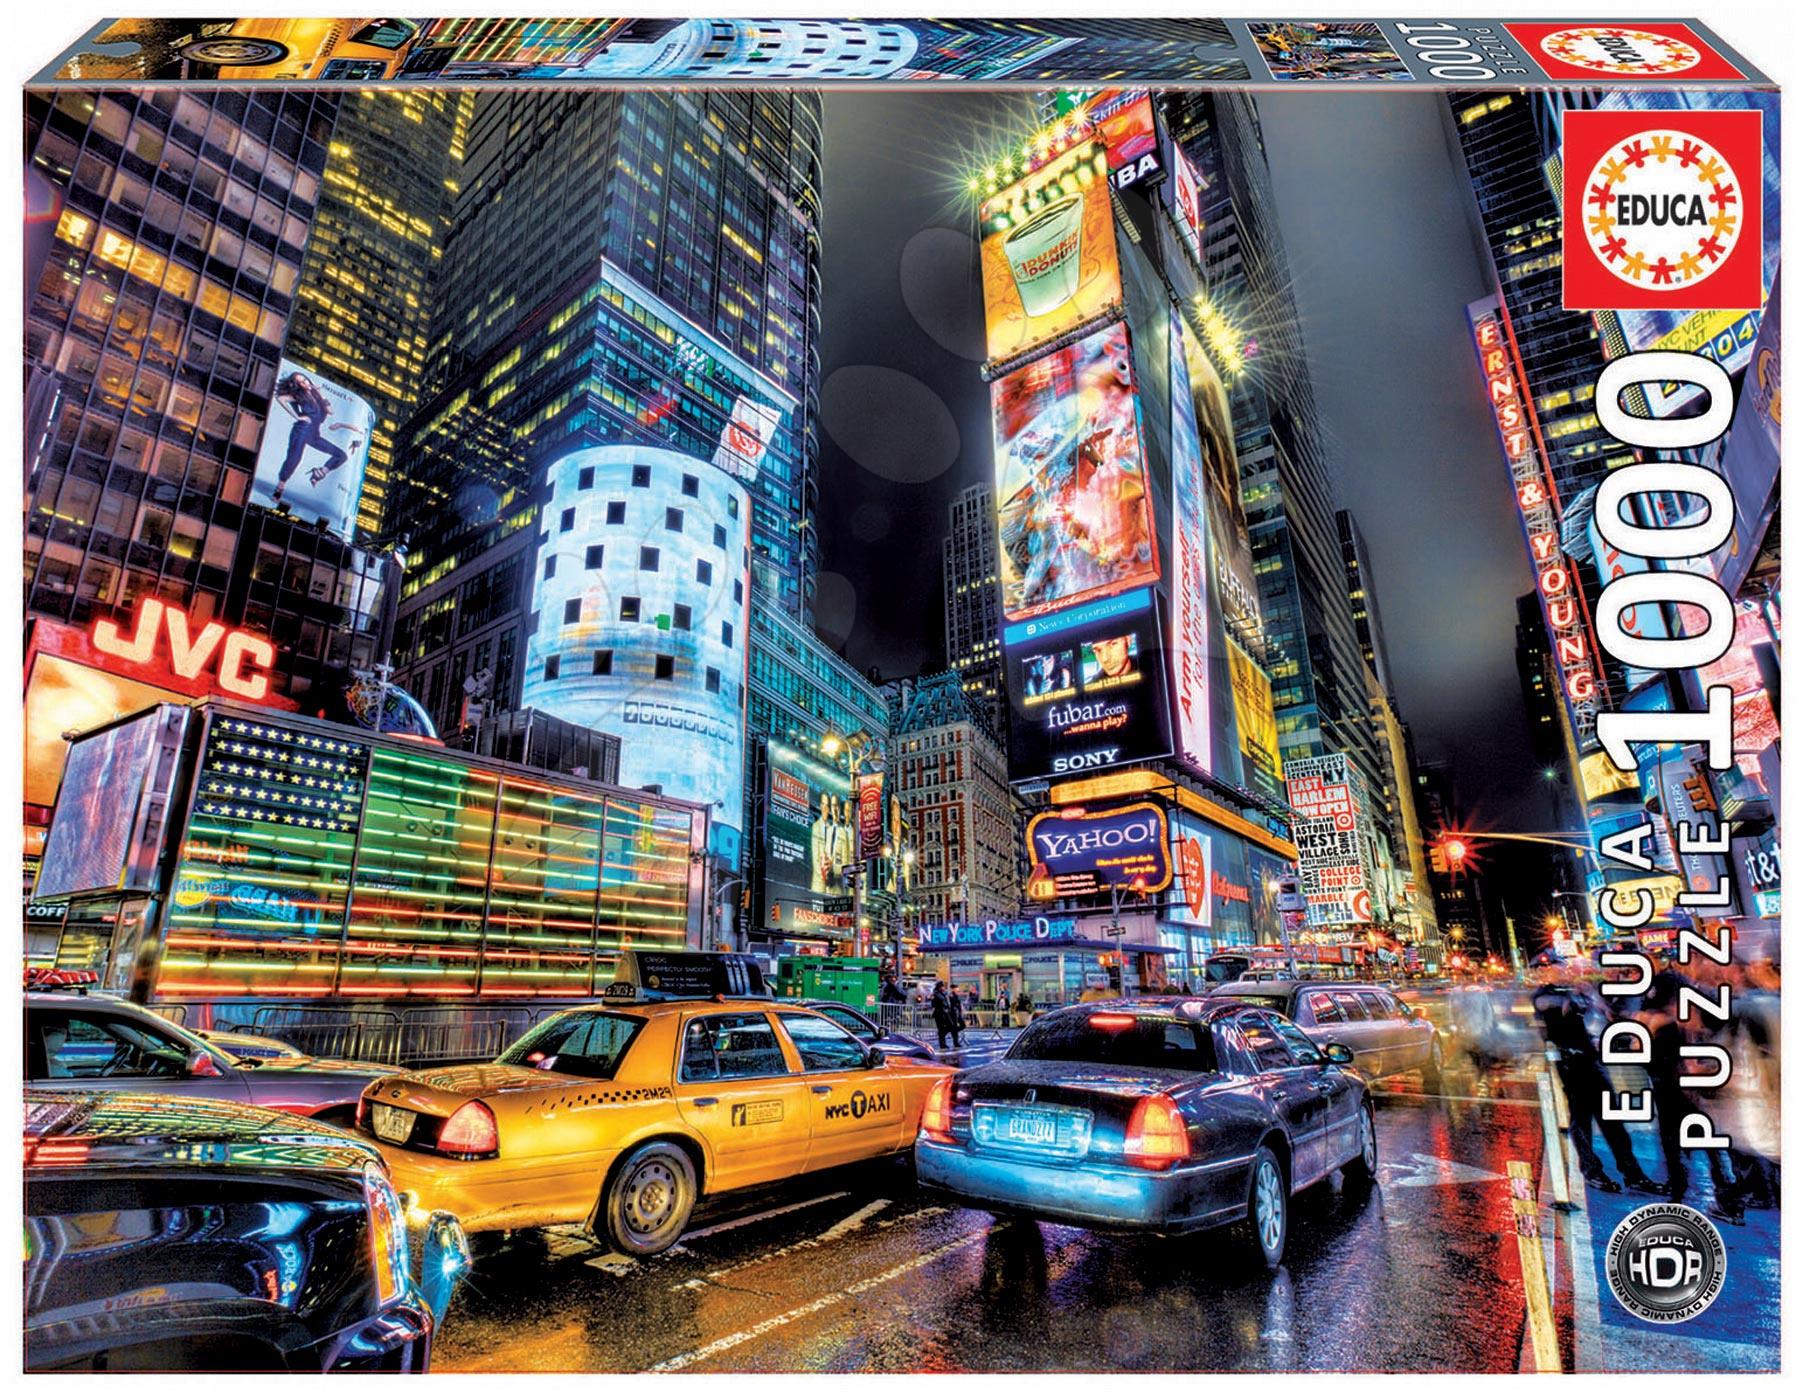 Puzzle 1000 dielne - Puzzle Times Square Educa 1000 dielov od 12 rokov